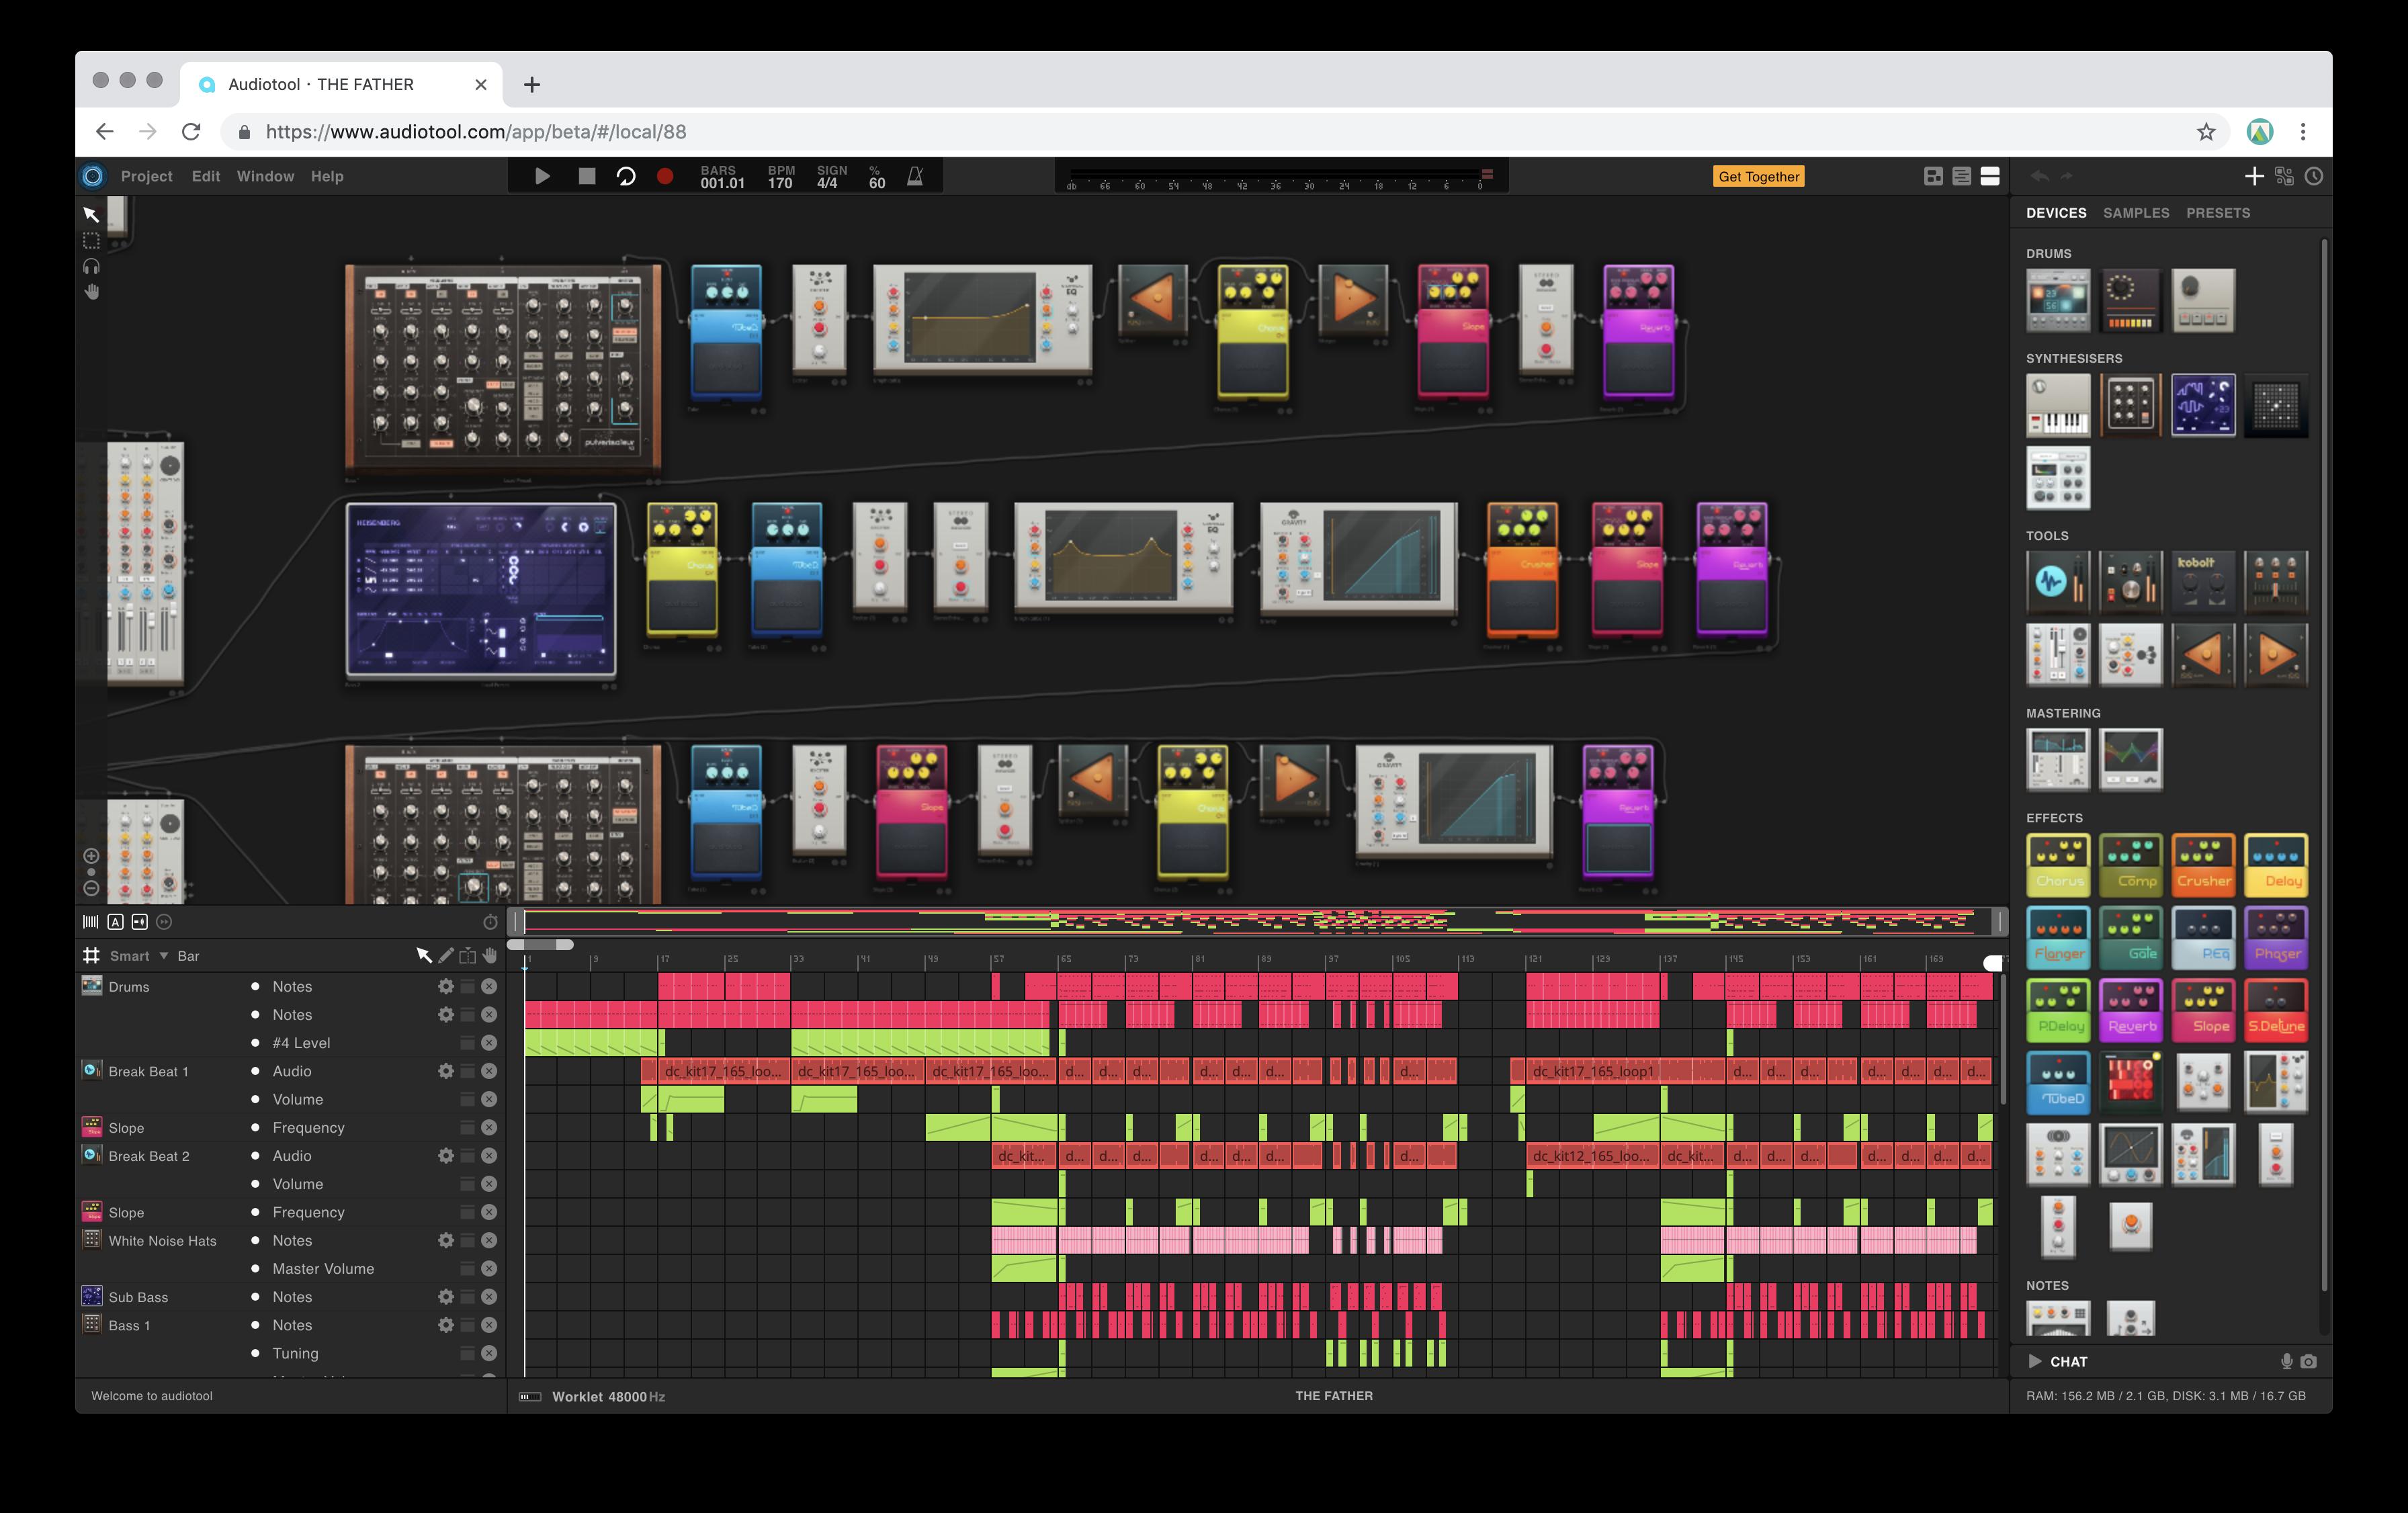 Audiotool dashboard